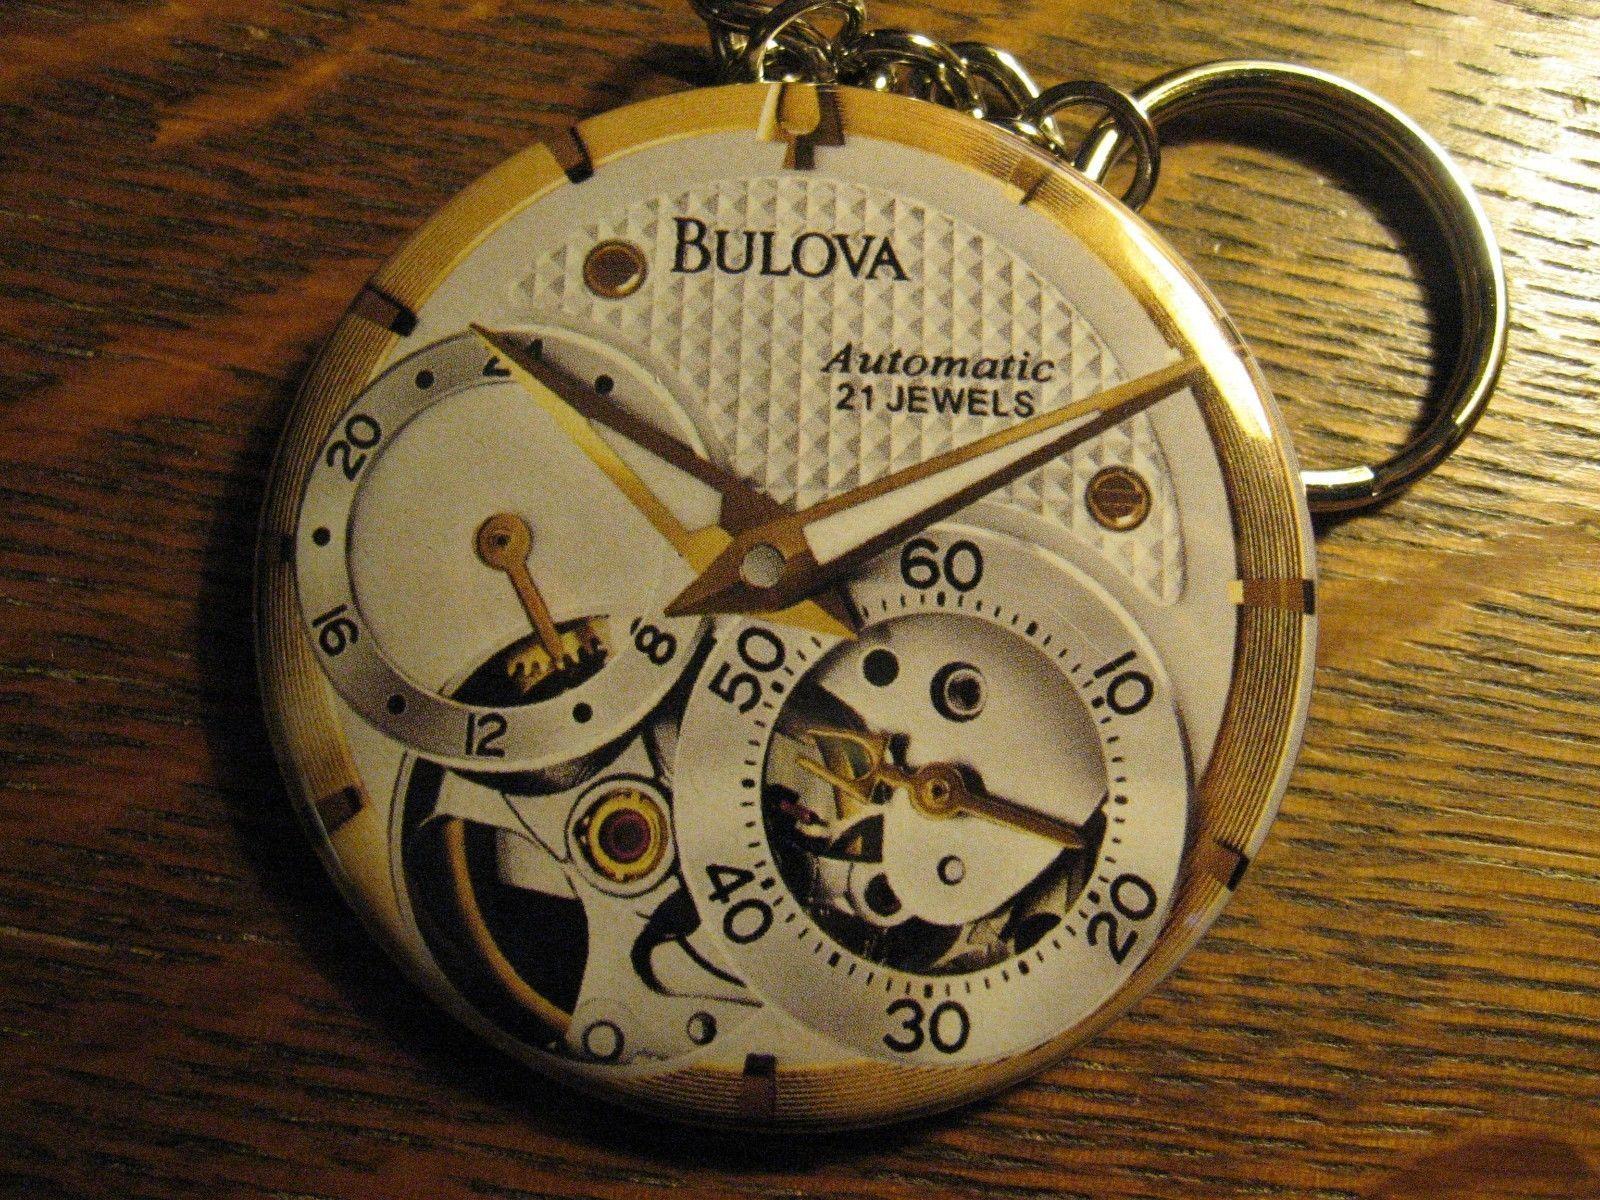 Bulova 21 Jewels Keychain - Repurposed Magazine Ad Backpack Purse Clip Ornament